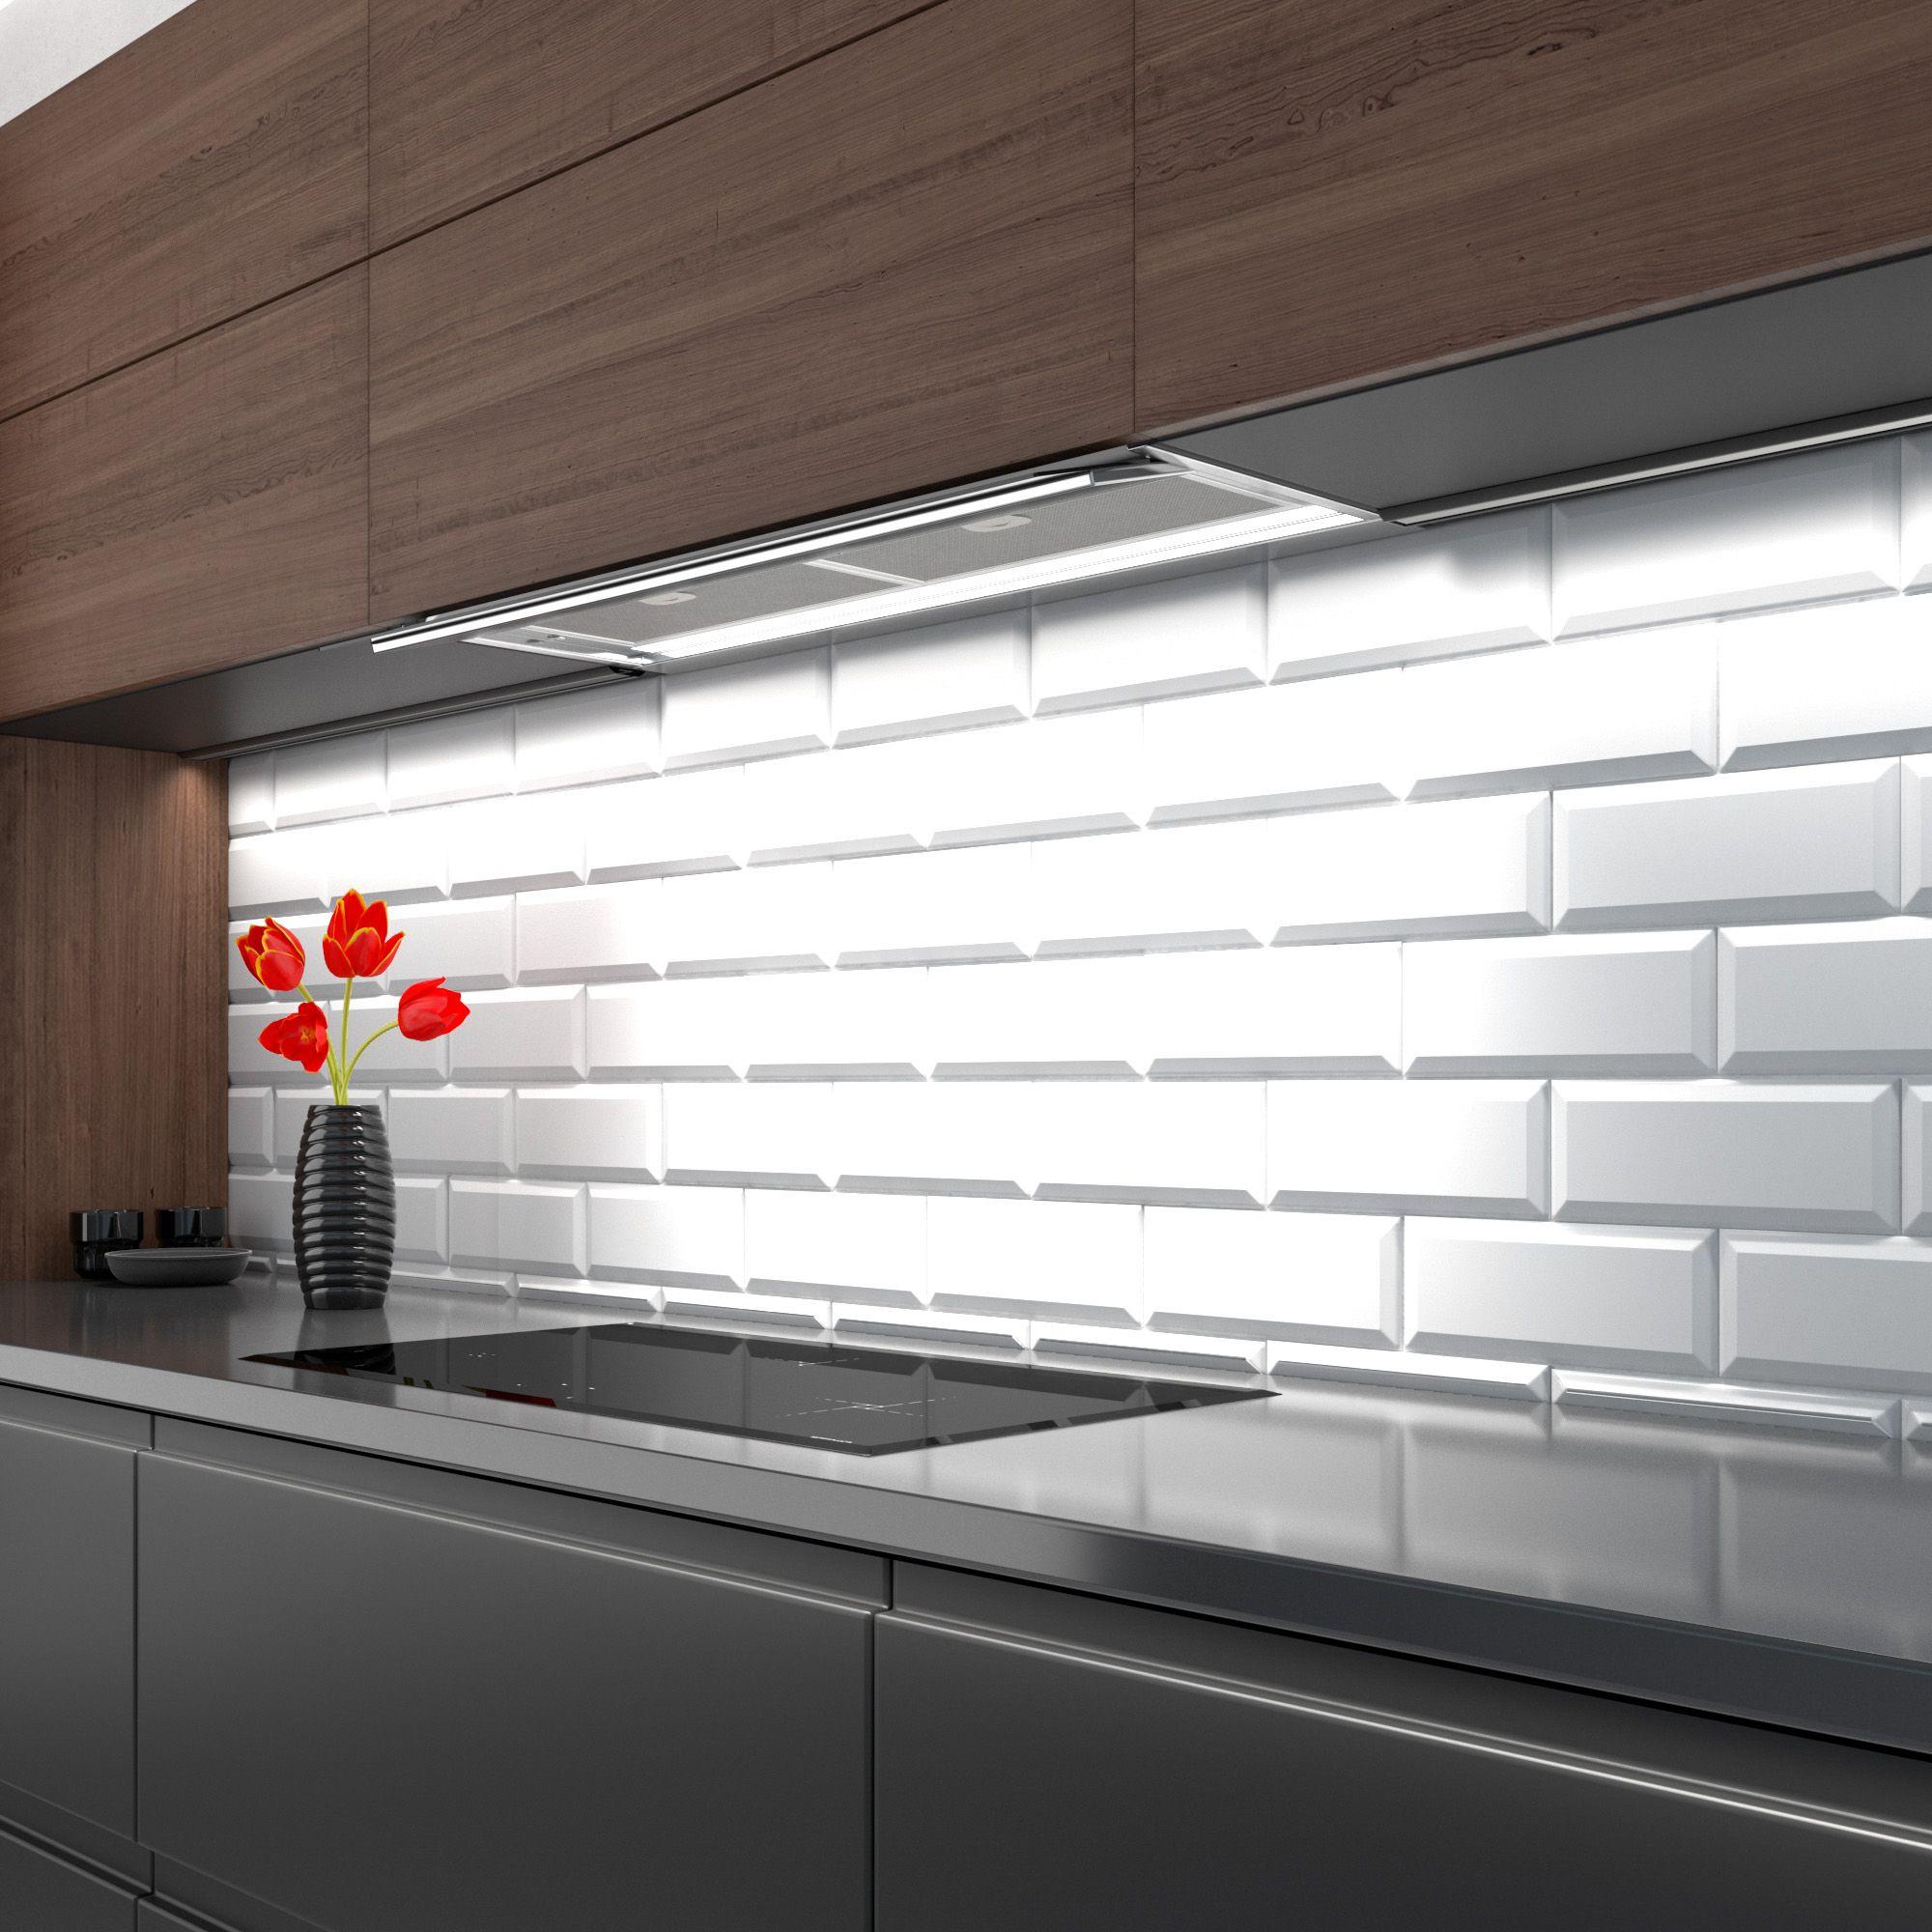 Futuro Futuro 36 Inch Decorsa Insert Range Hood In 2020 Kitchen Ventilation Kitchen Design Kitchen Fan